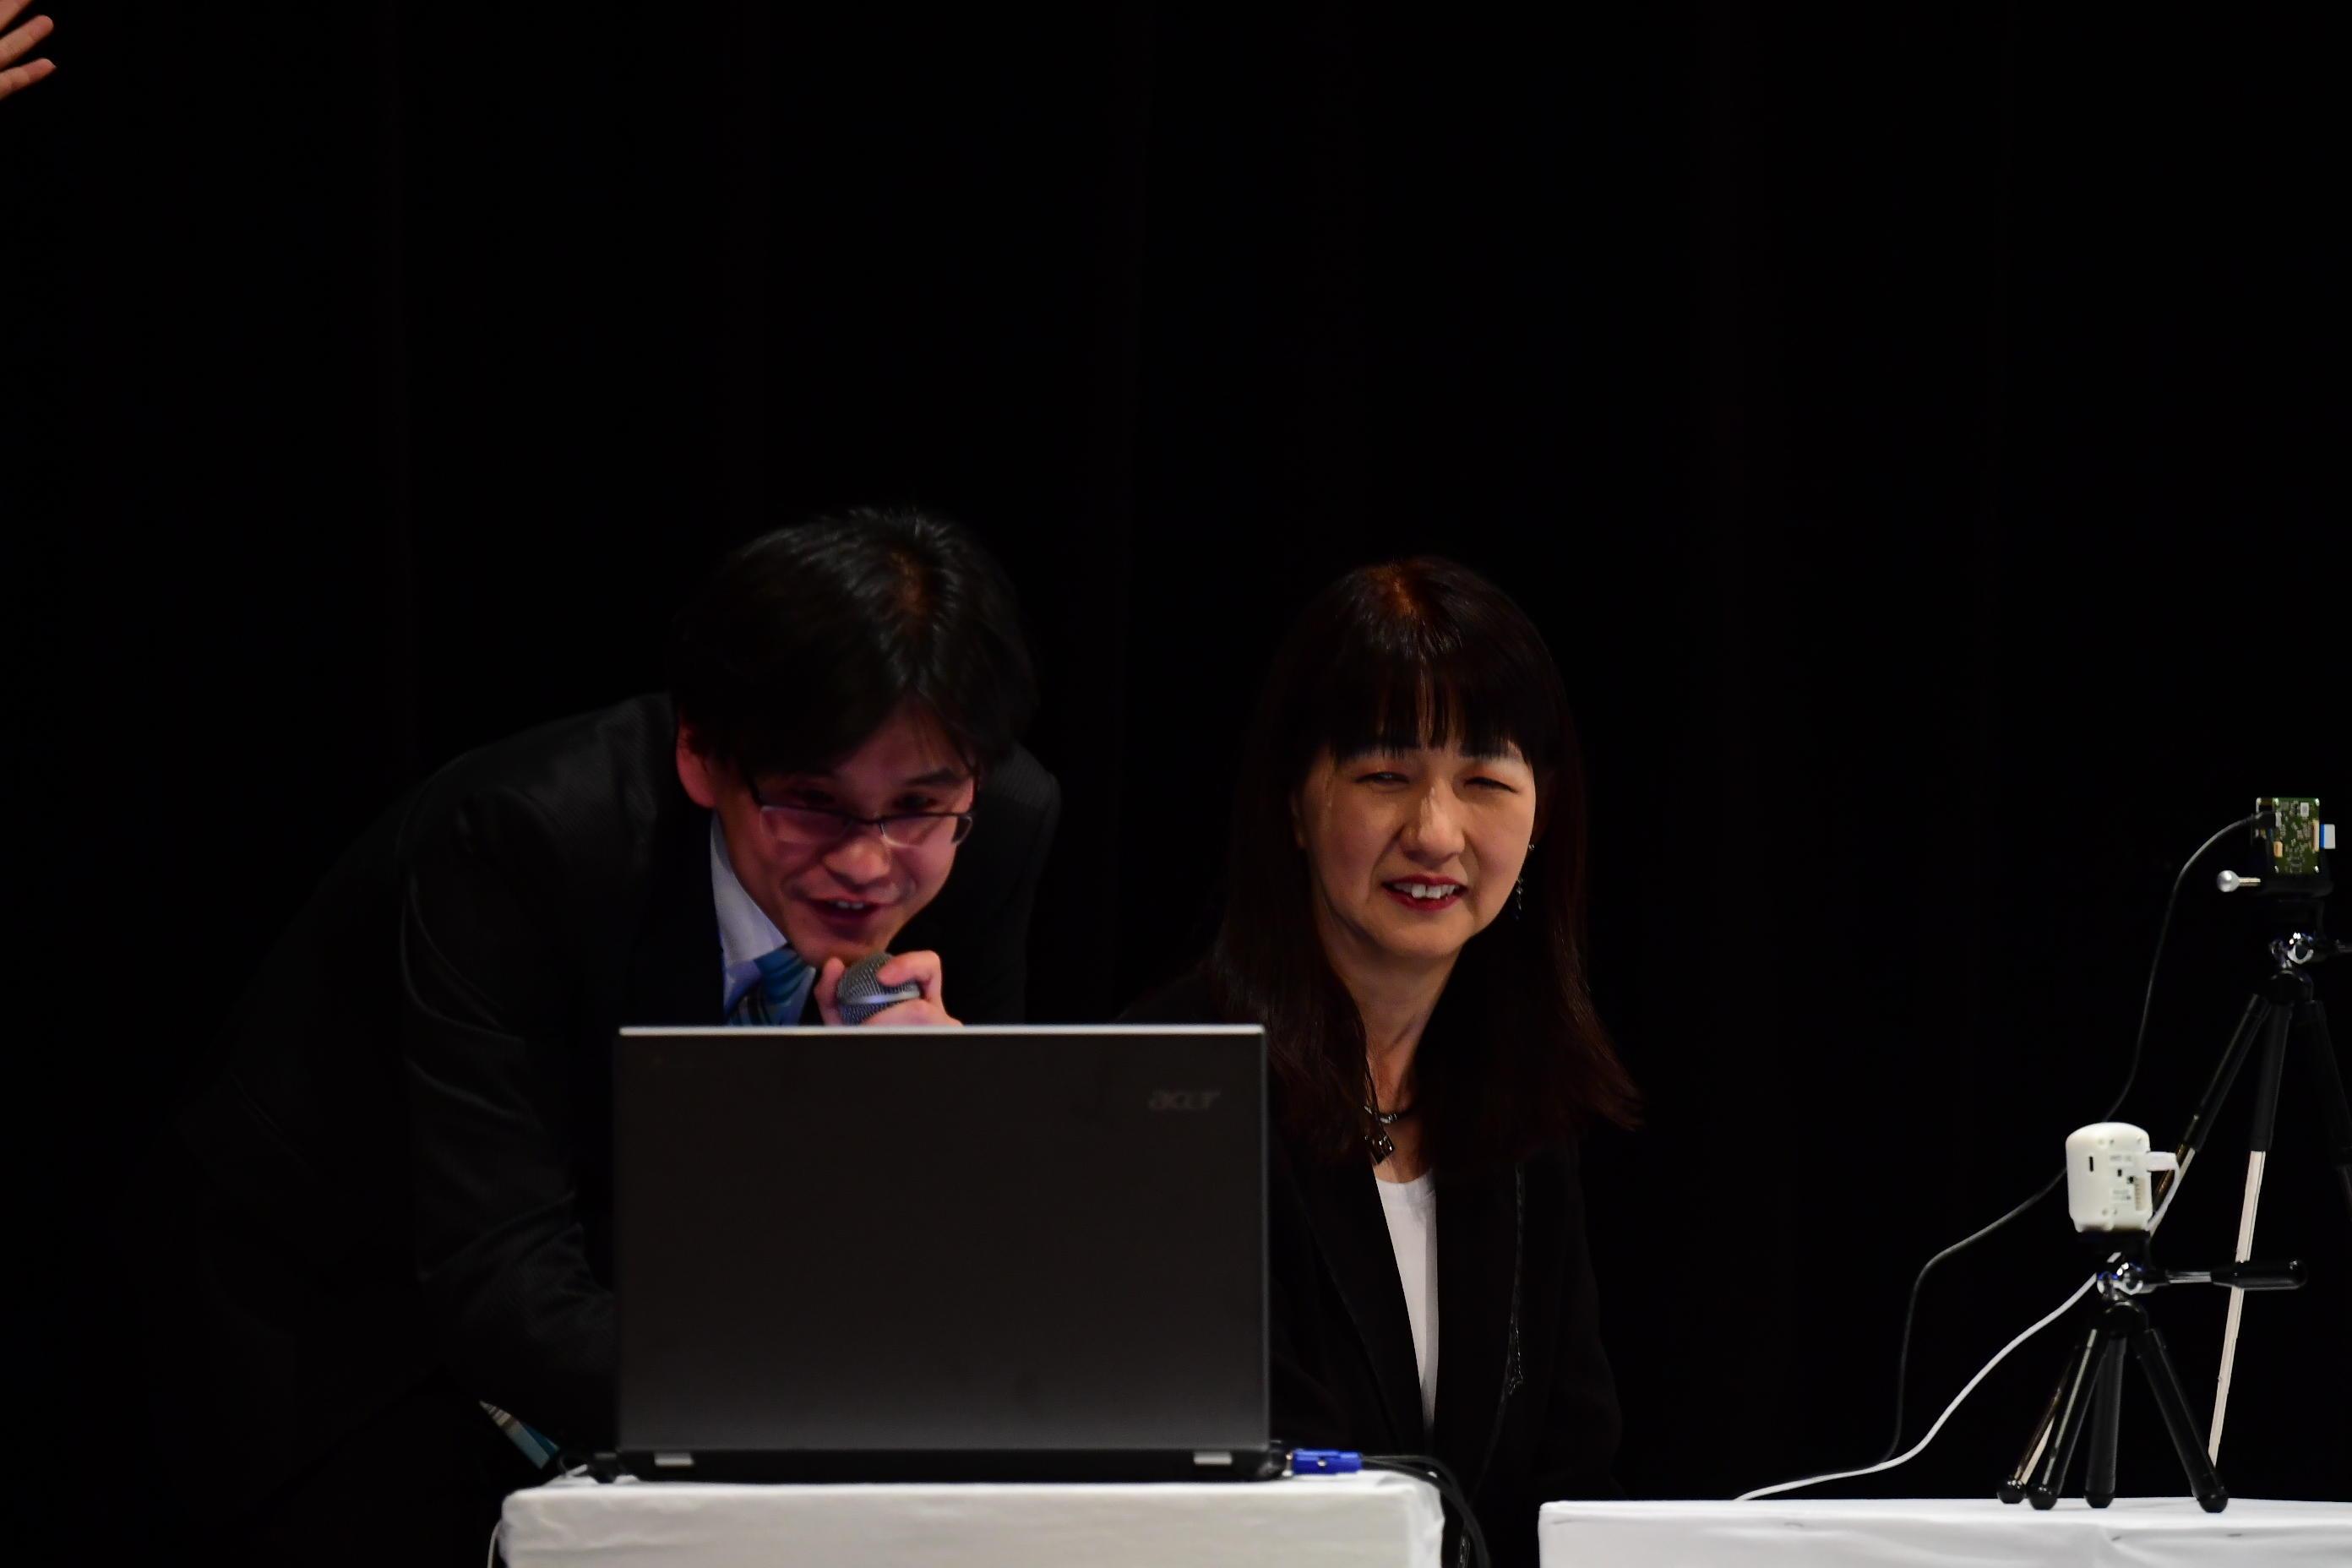 http://news.yoshimoto.co.jp/20170215203004-dfd29597b85e8f055c200cb1046d430420e0e228.jpg